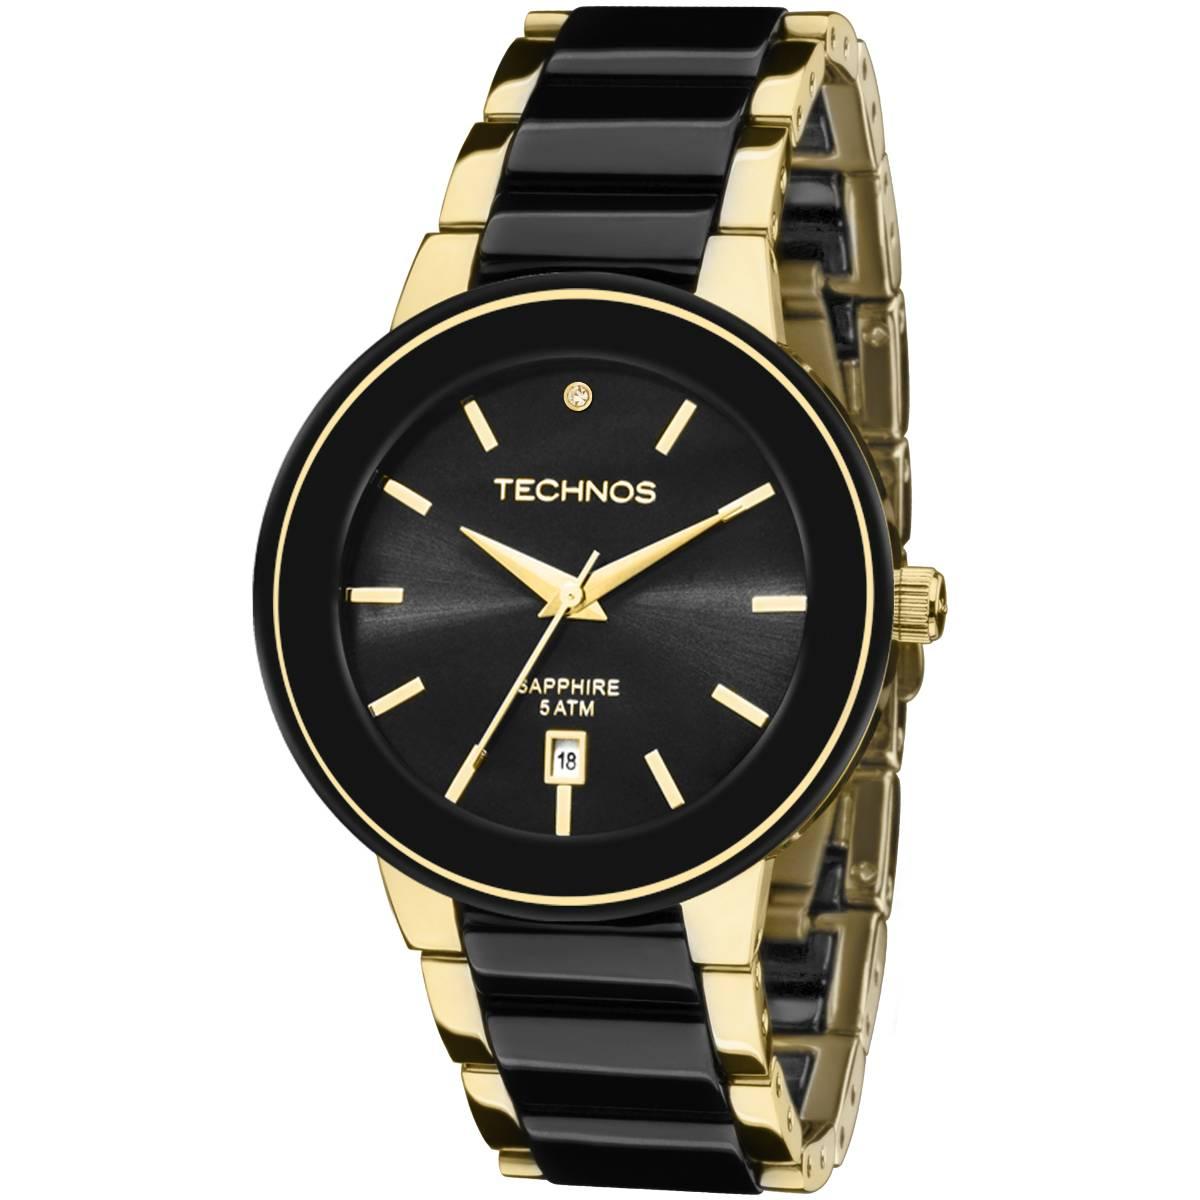 Relógio Technos Elegance Ceramic Feminino Sapphire Quartz 2115KRS/4P